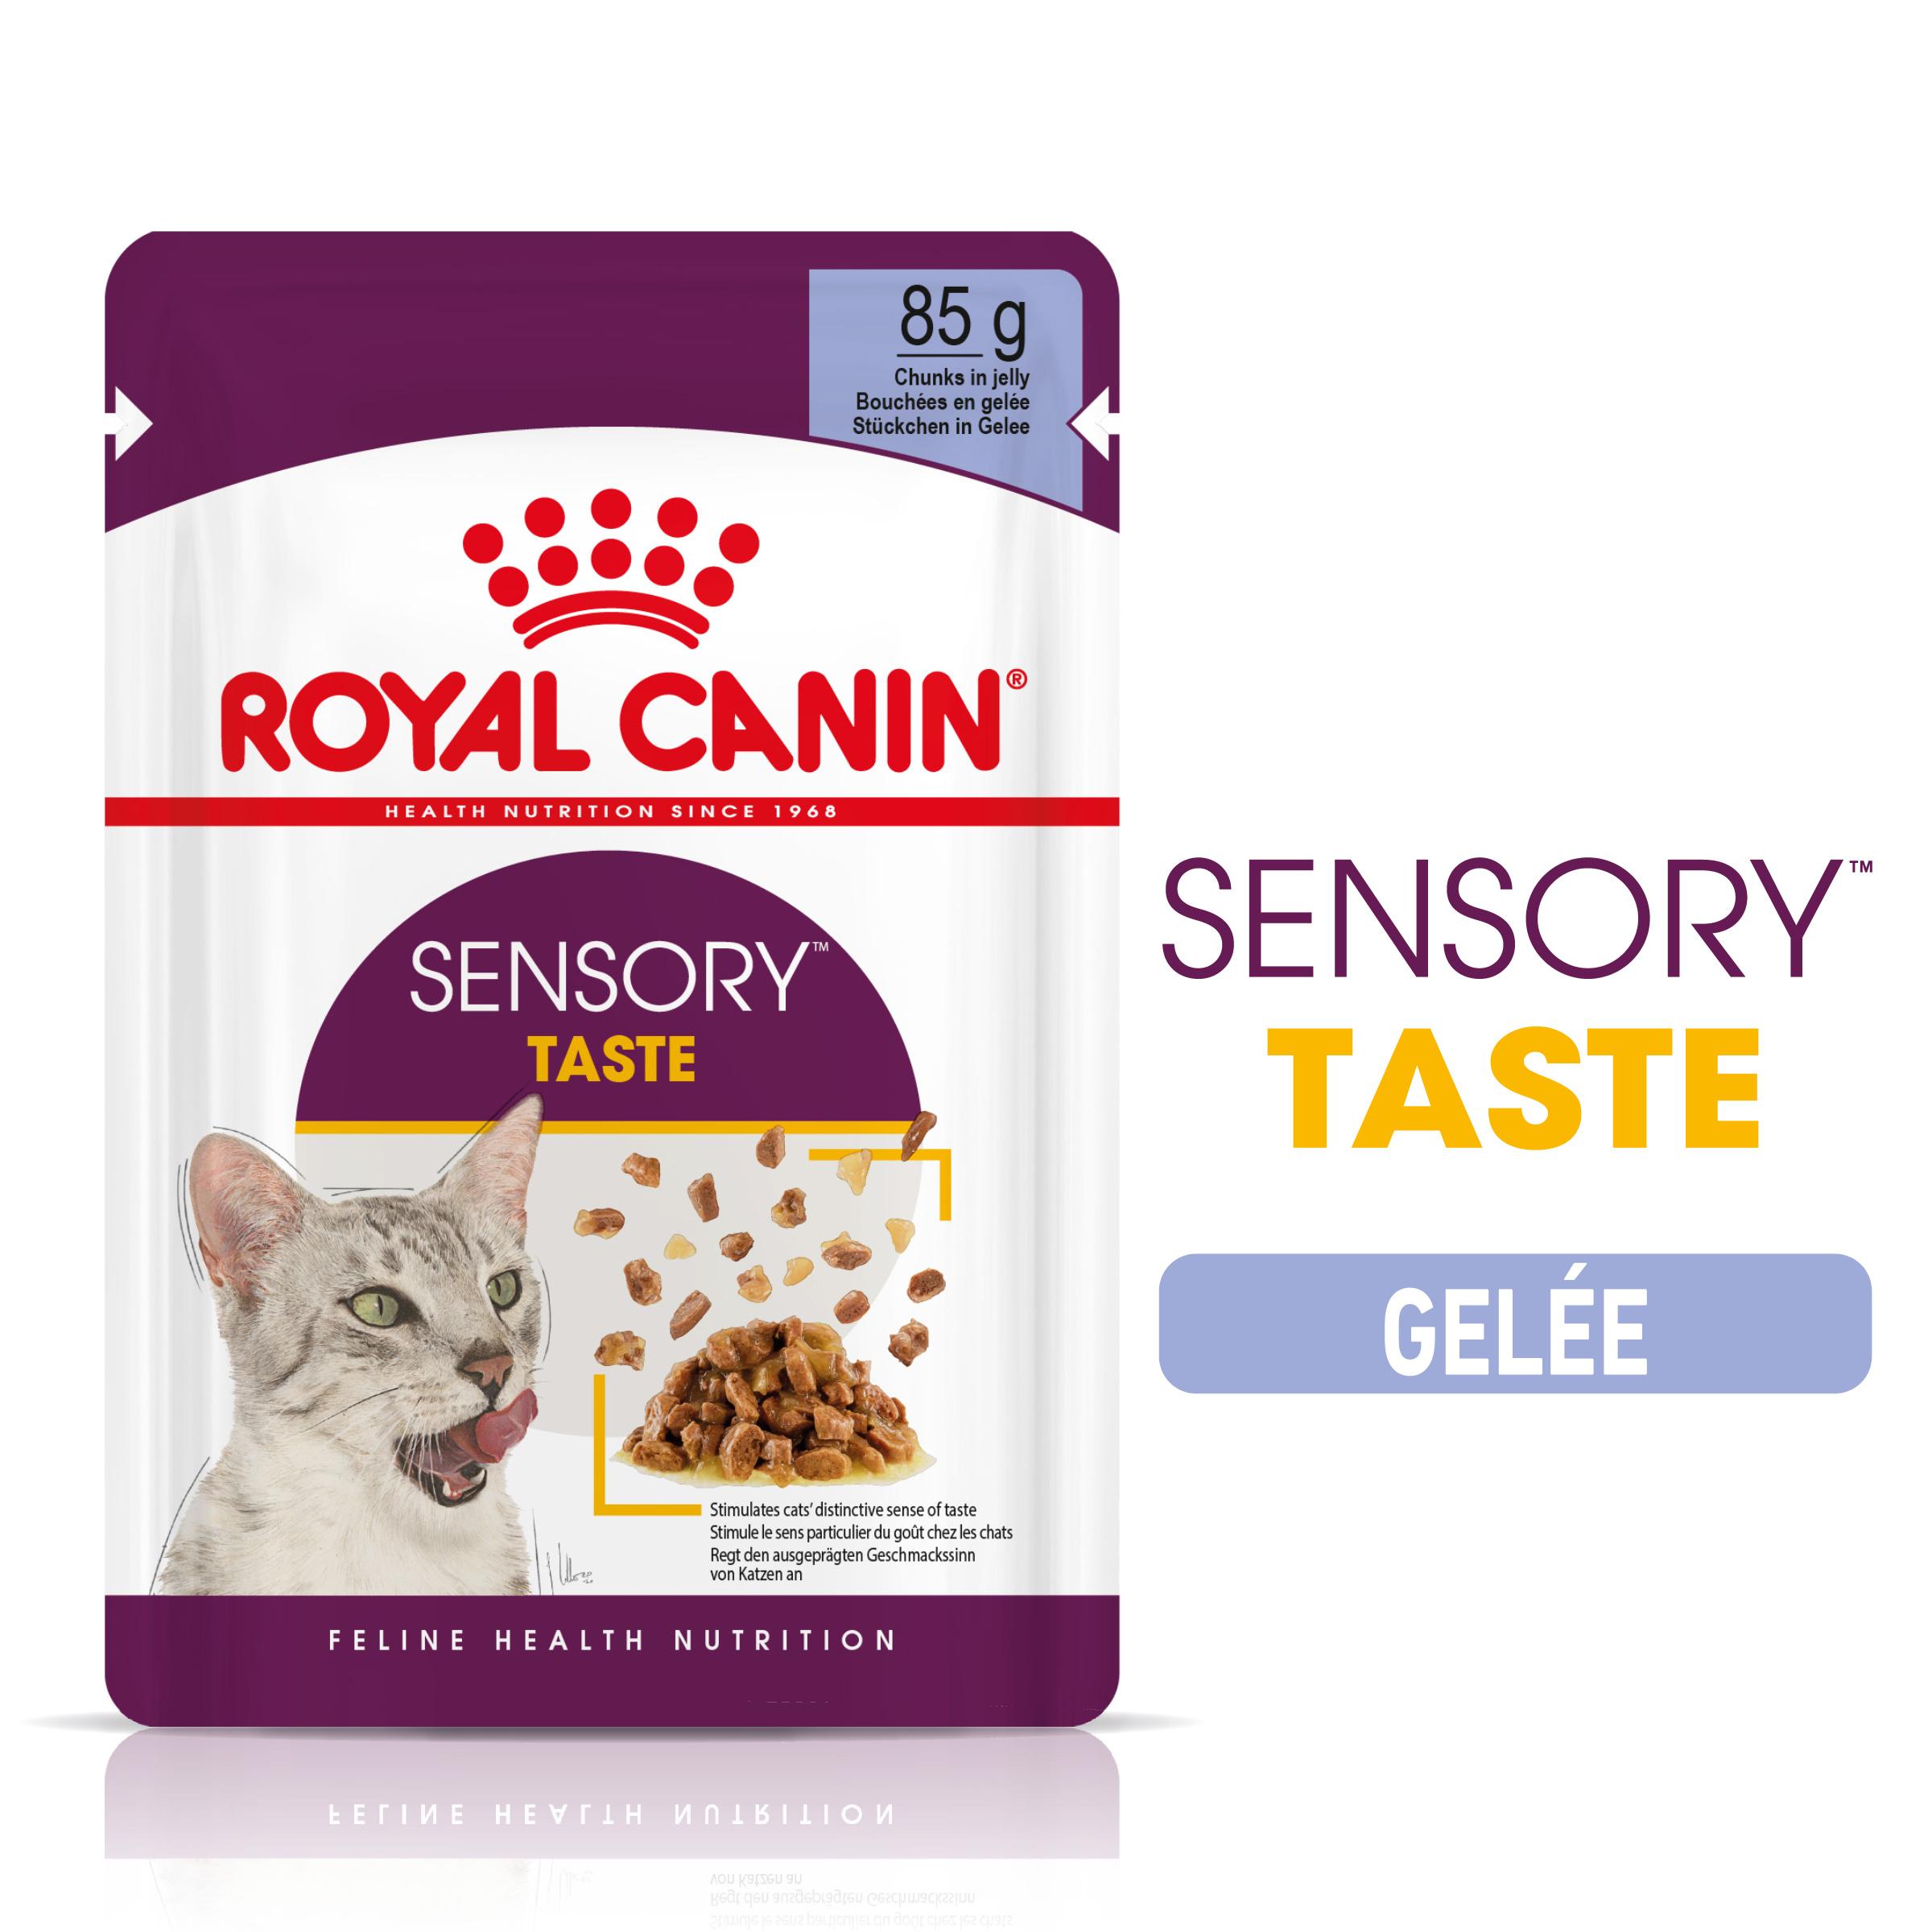 Sensory™ Taste gelée